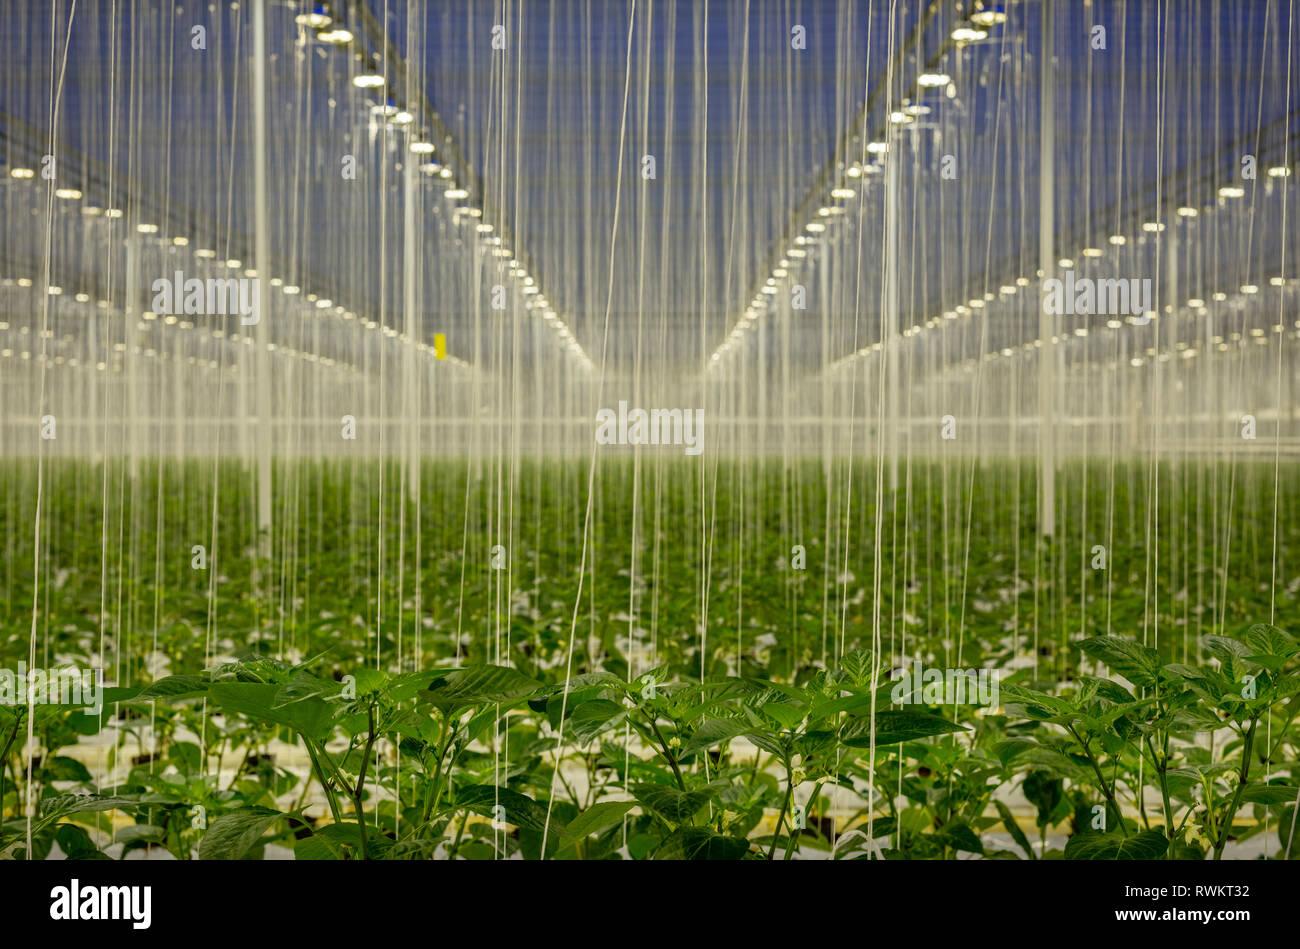 Growing bell peppers in modern dutch greenhouse, Zevenbergen, Noord-Brabant, Netherlands Stock Photo